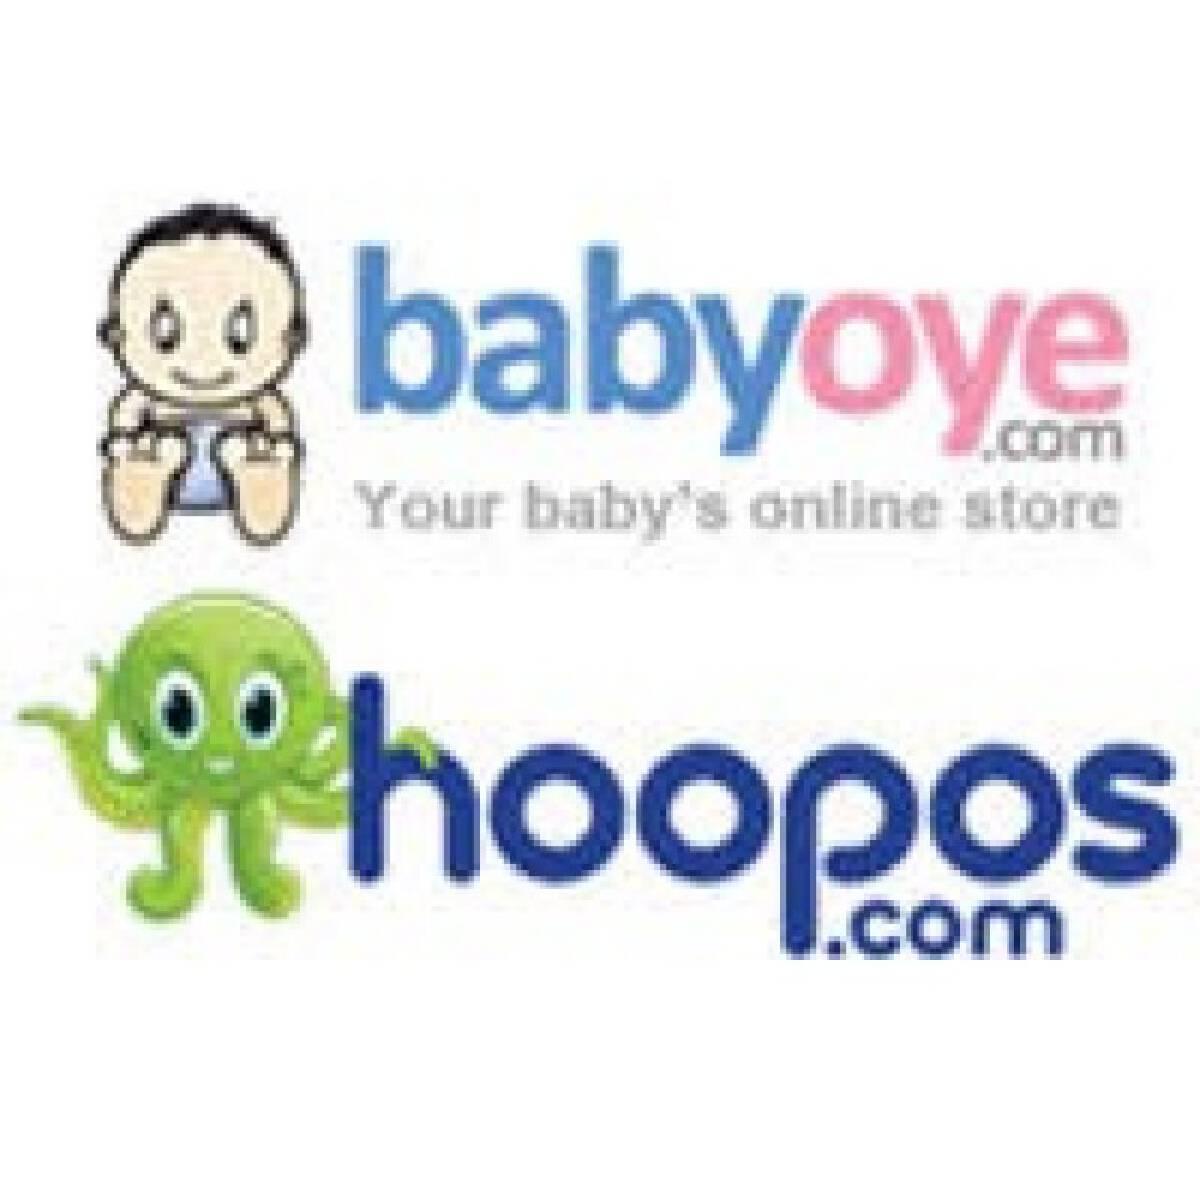 "DITP ชี้ช่องผู้ผลิต ผู้ส่งออกไทย ขยายตลาด ""สินค้าสำหรับทารก"" เจาะตลาดอินเดีย"